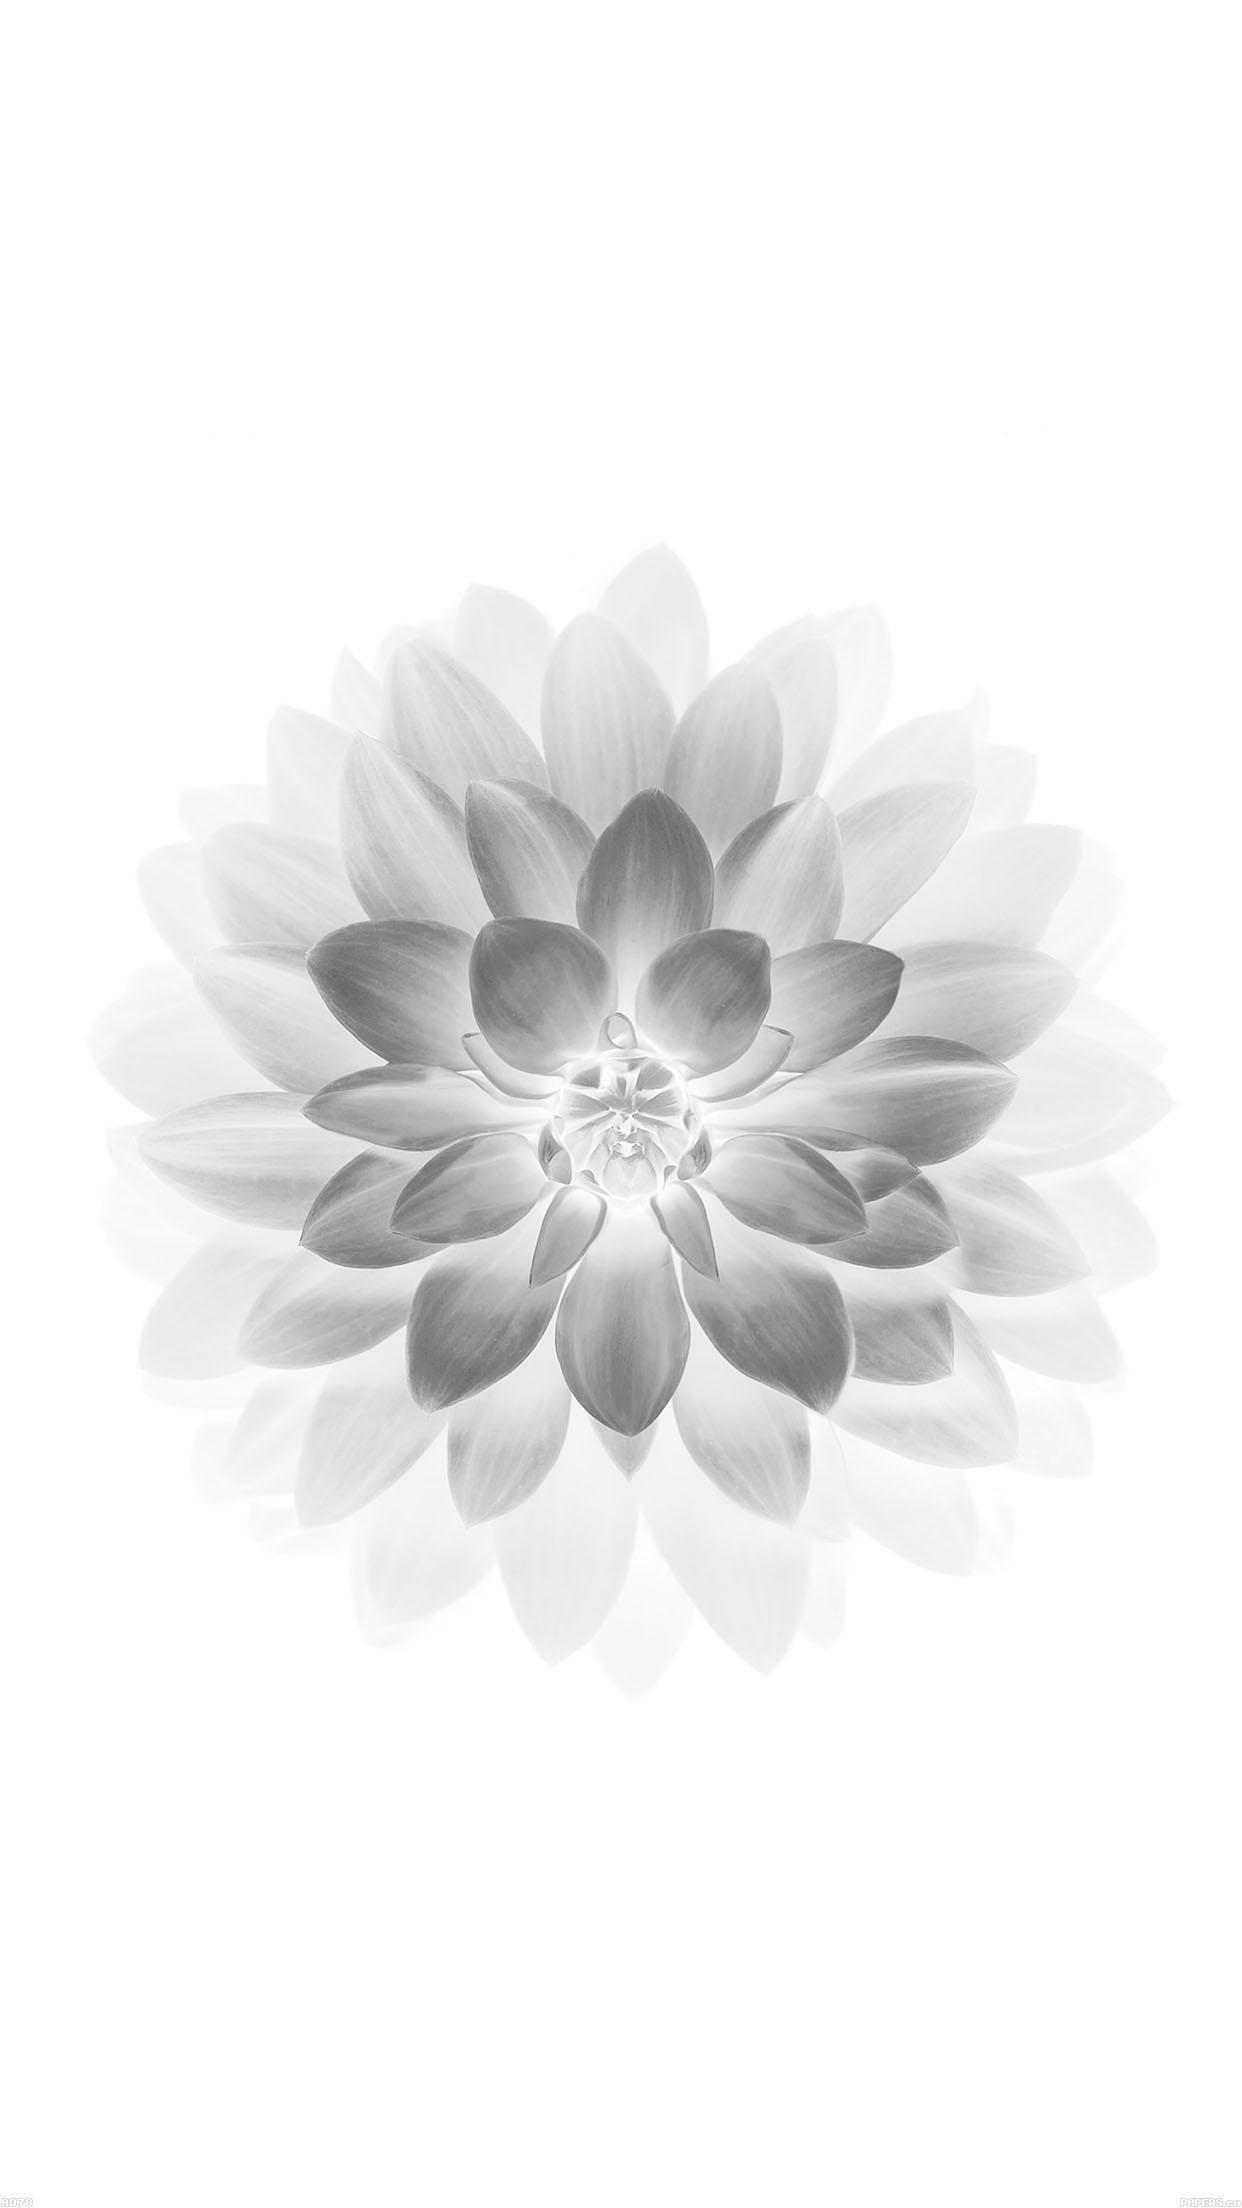 1080x1920 White Siberian Tiger IPhone 6 Wallpaper